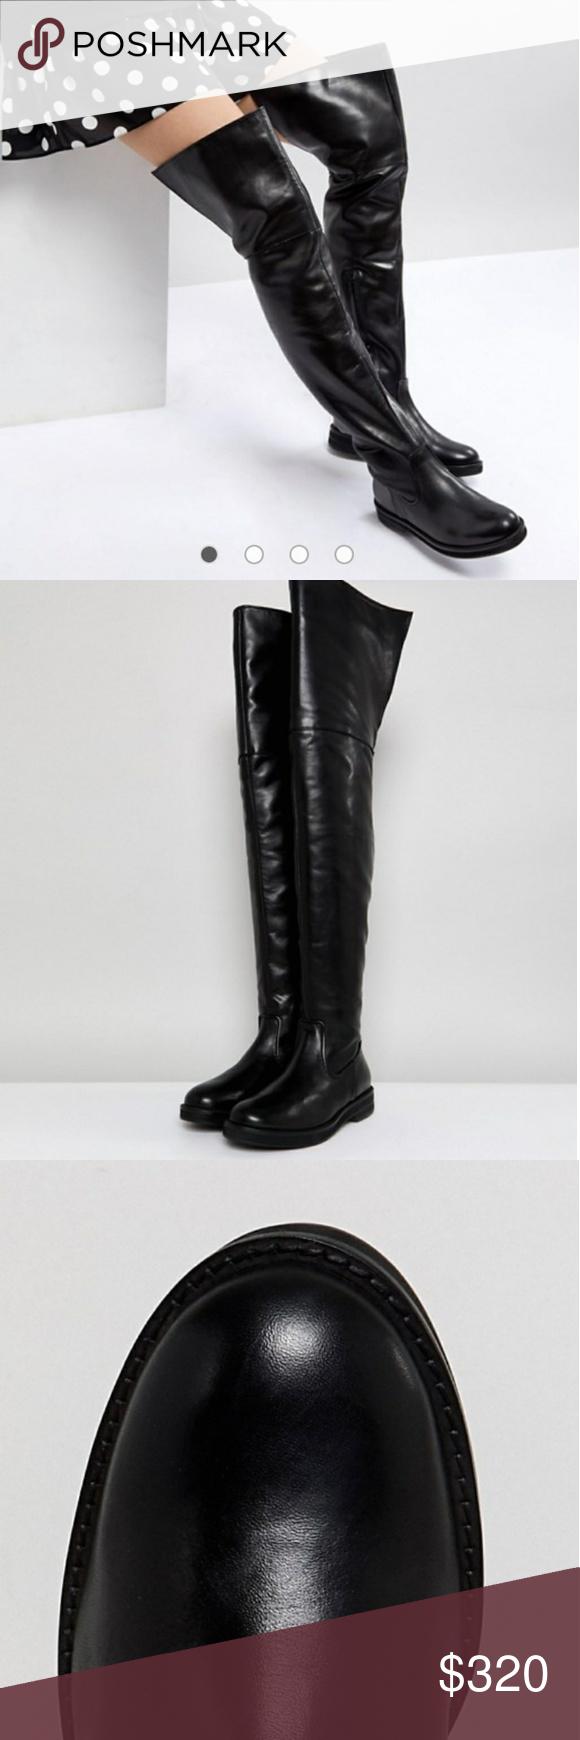 f47cb6a619c $320 Mango Leather Flat Knee High Boot OTK Black Boots by Mango ...